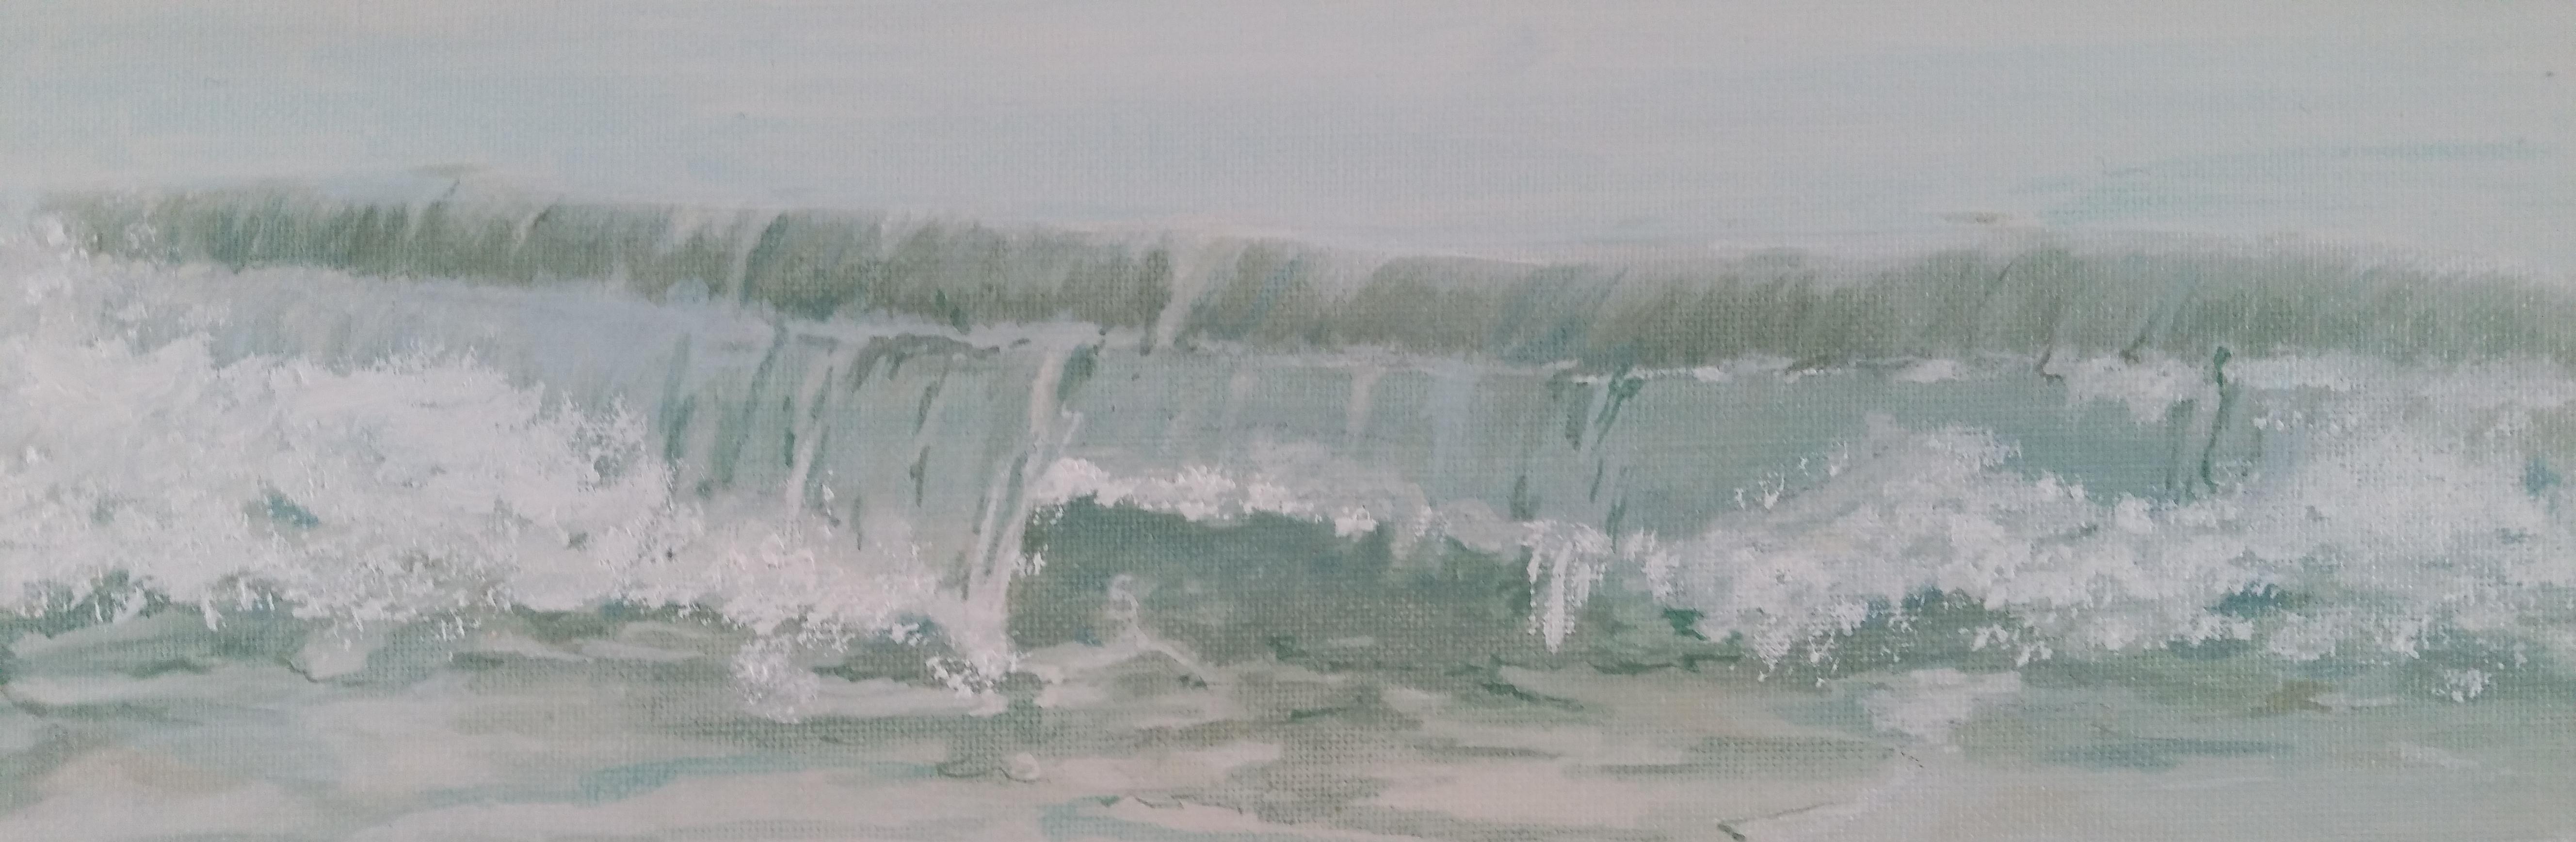 G.B Artiste Peintre